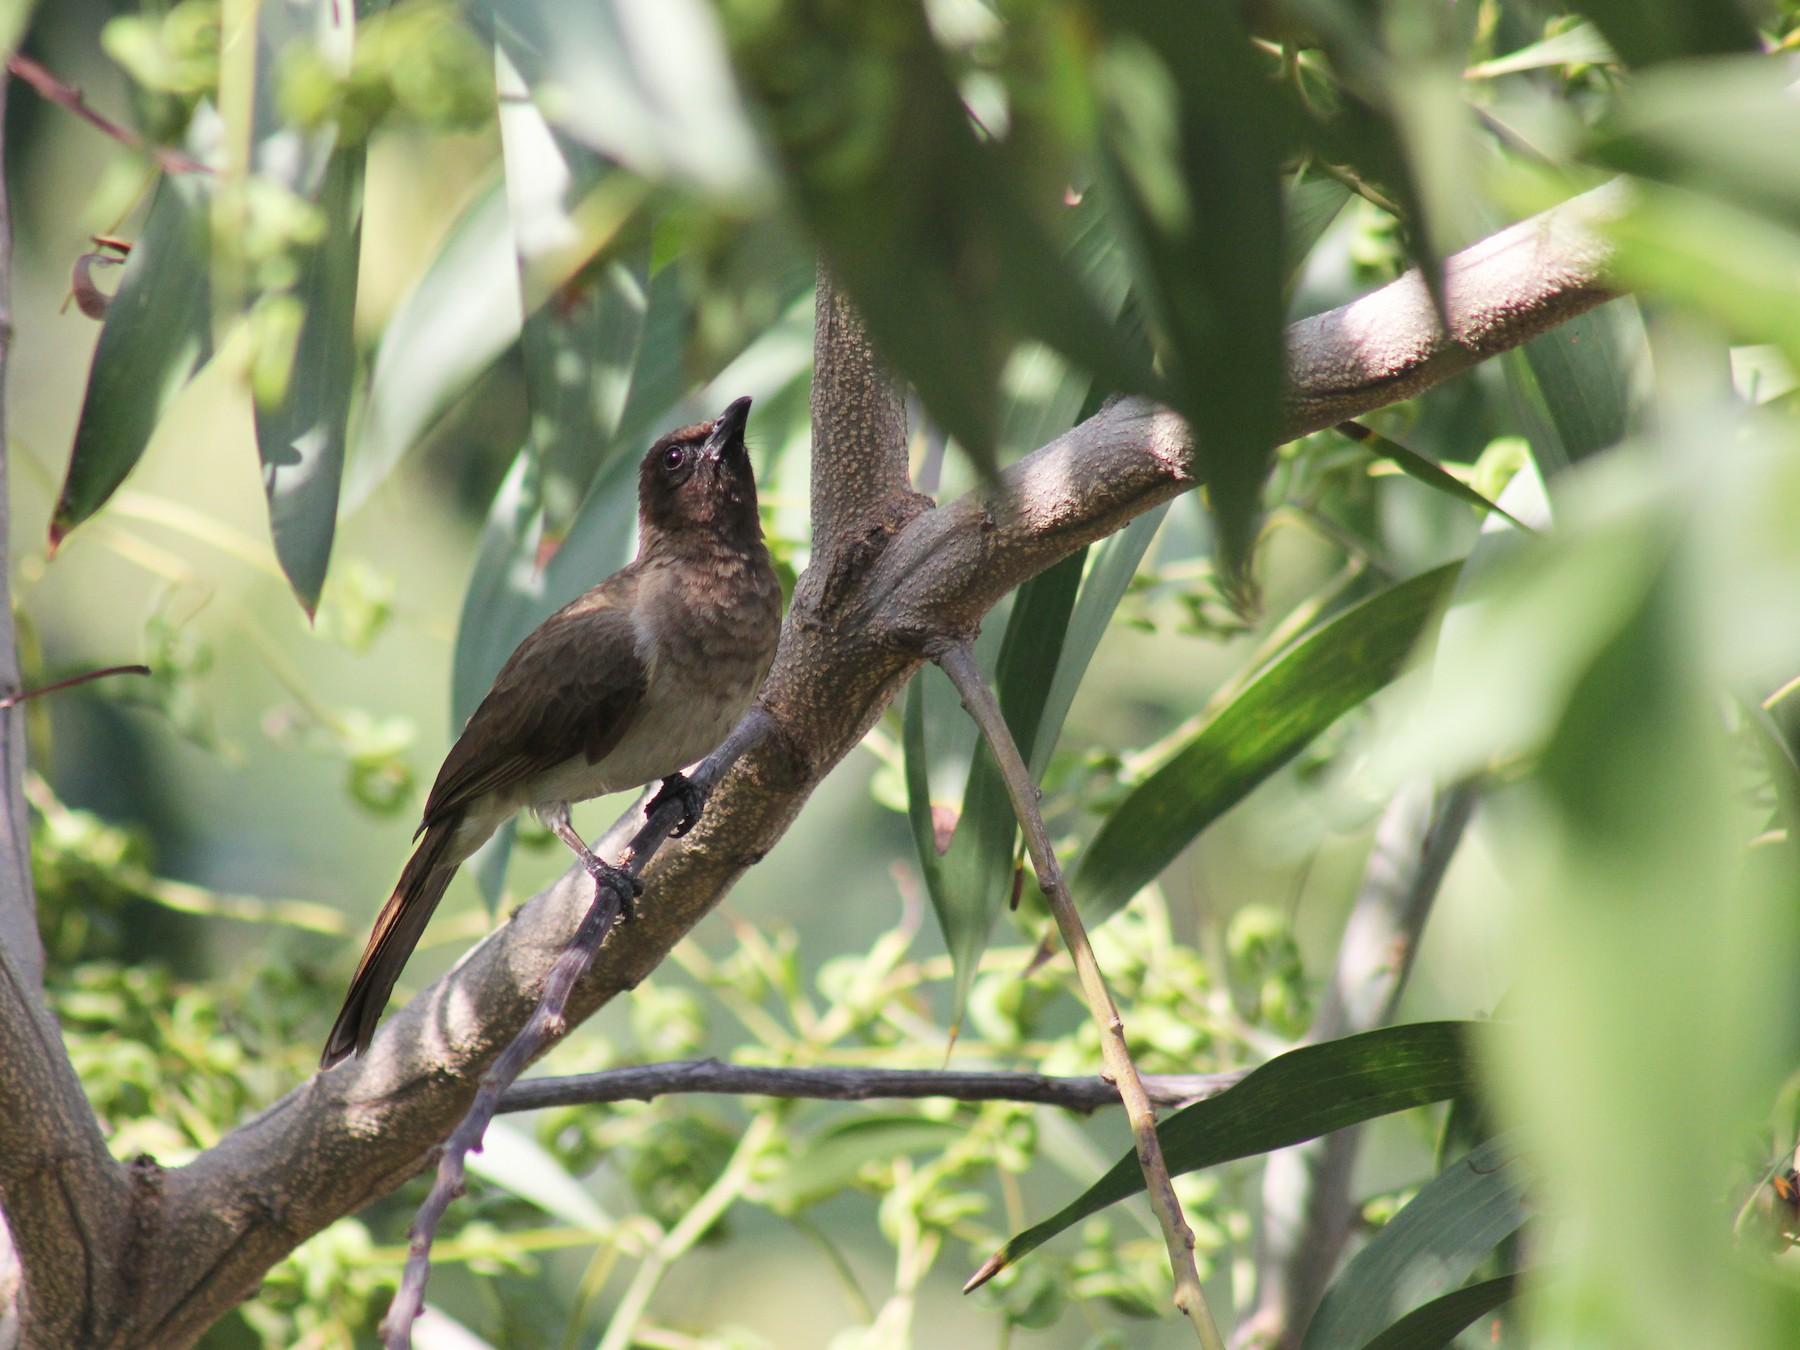 Common Bulbul - Kalyani Mirajkar